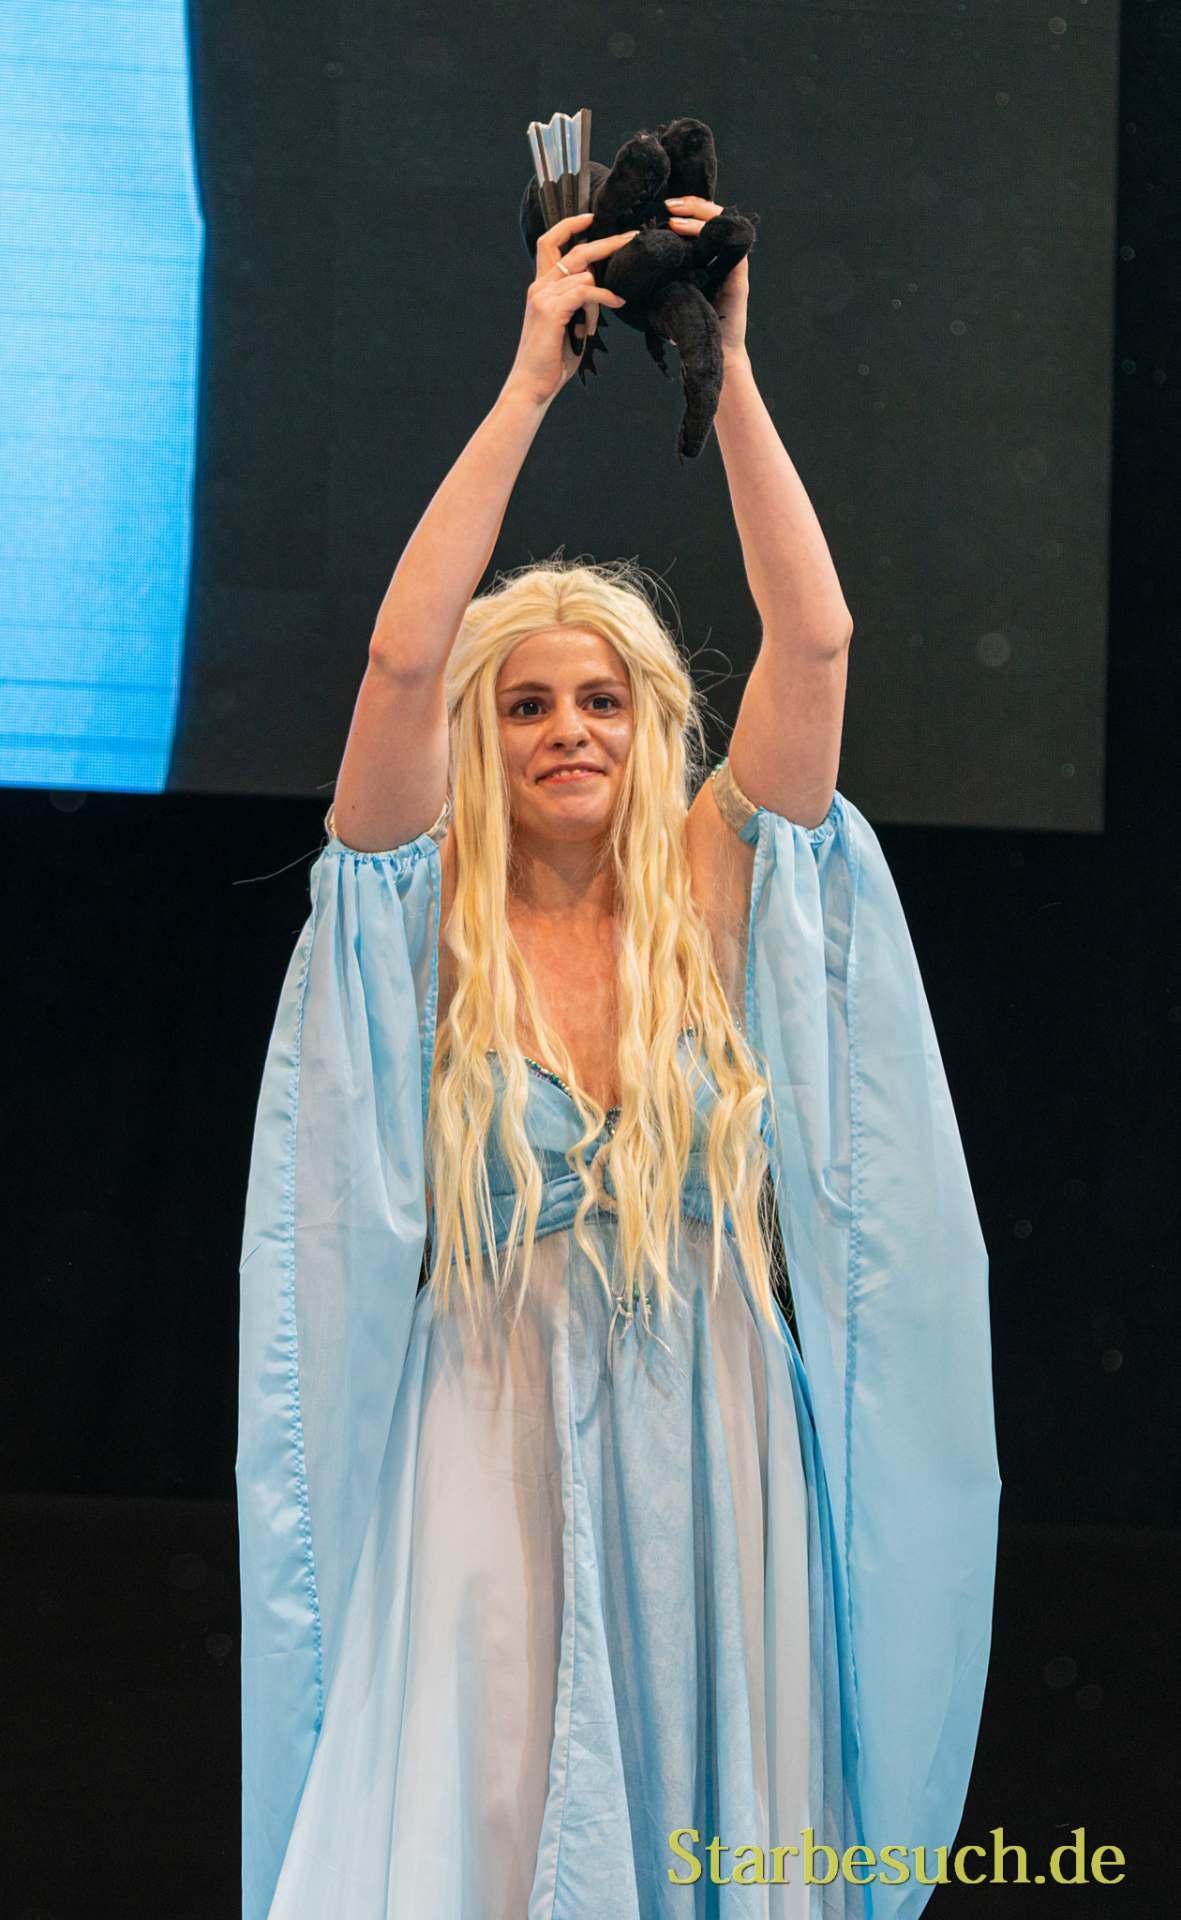 Cosplay Contest #33: Kaisu as Daenerys Targaryen from Game of Thrones